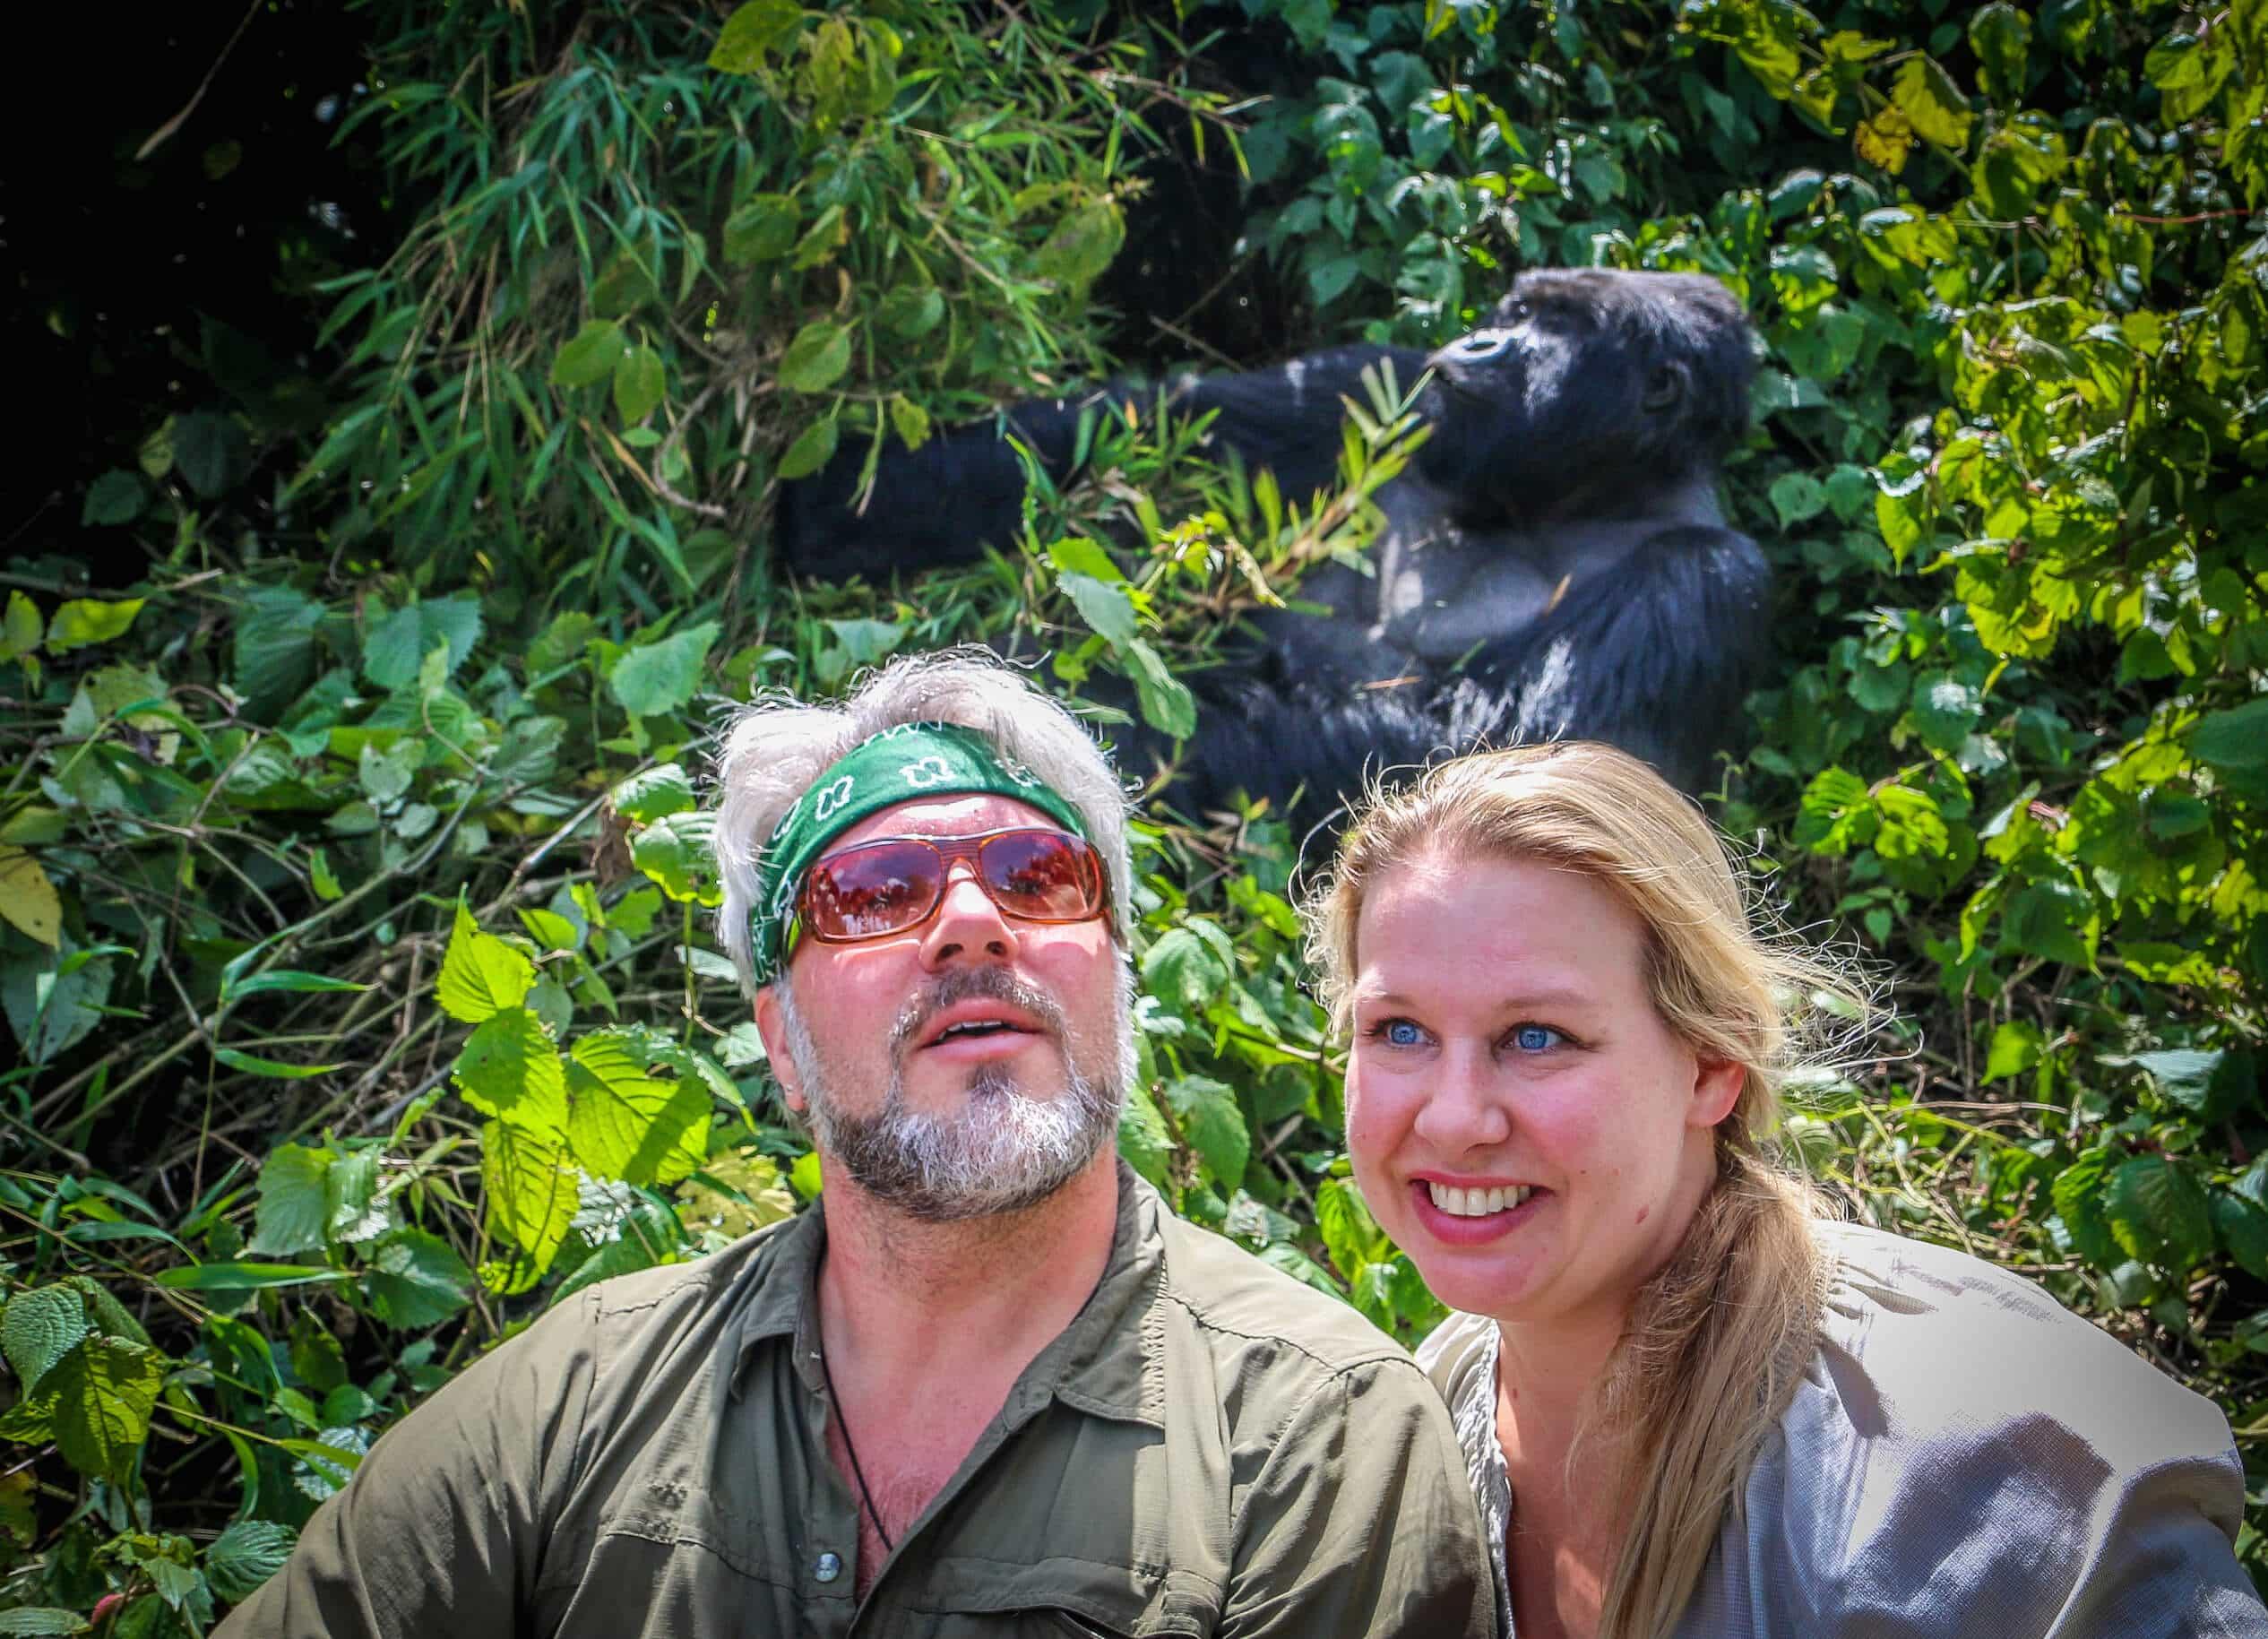 Bret Love & Mary Gabbett Travel bloggers